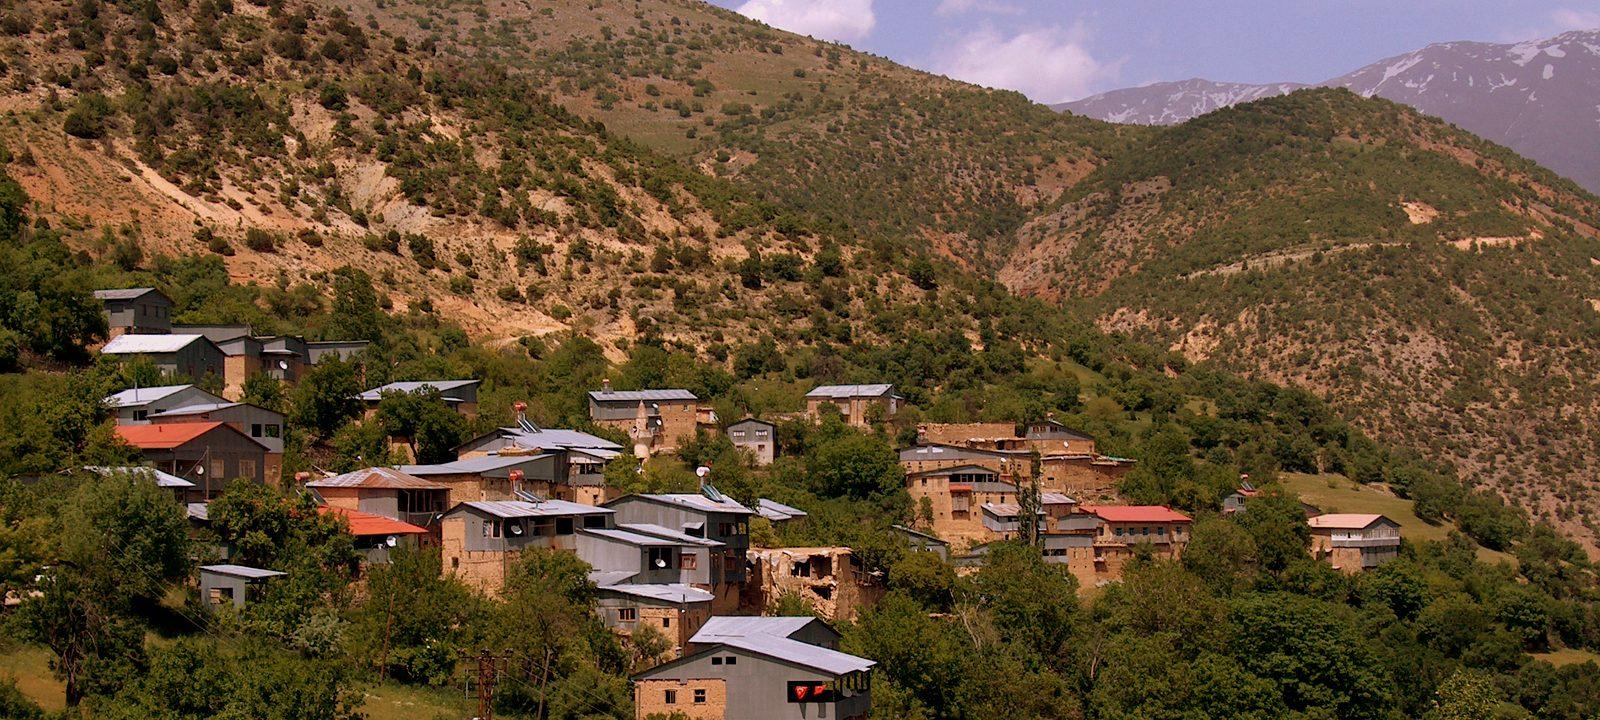 Tuğlu Köyü Tarihi